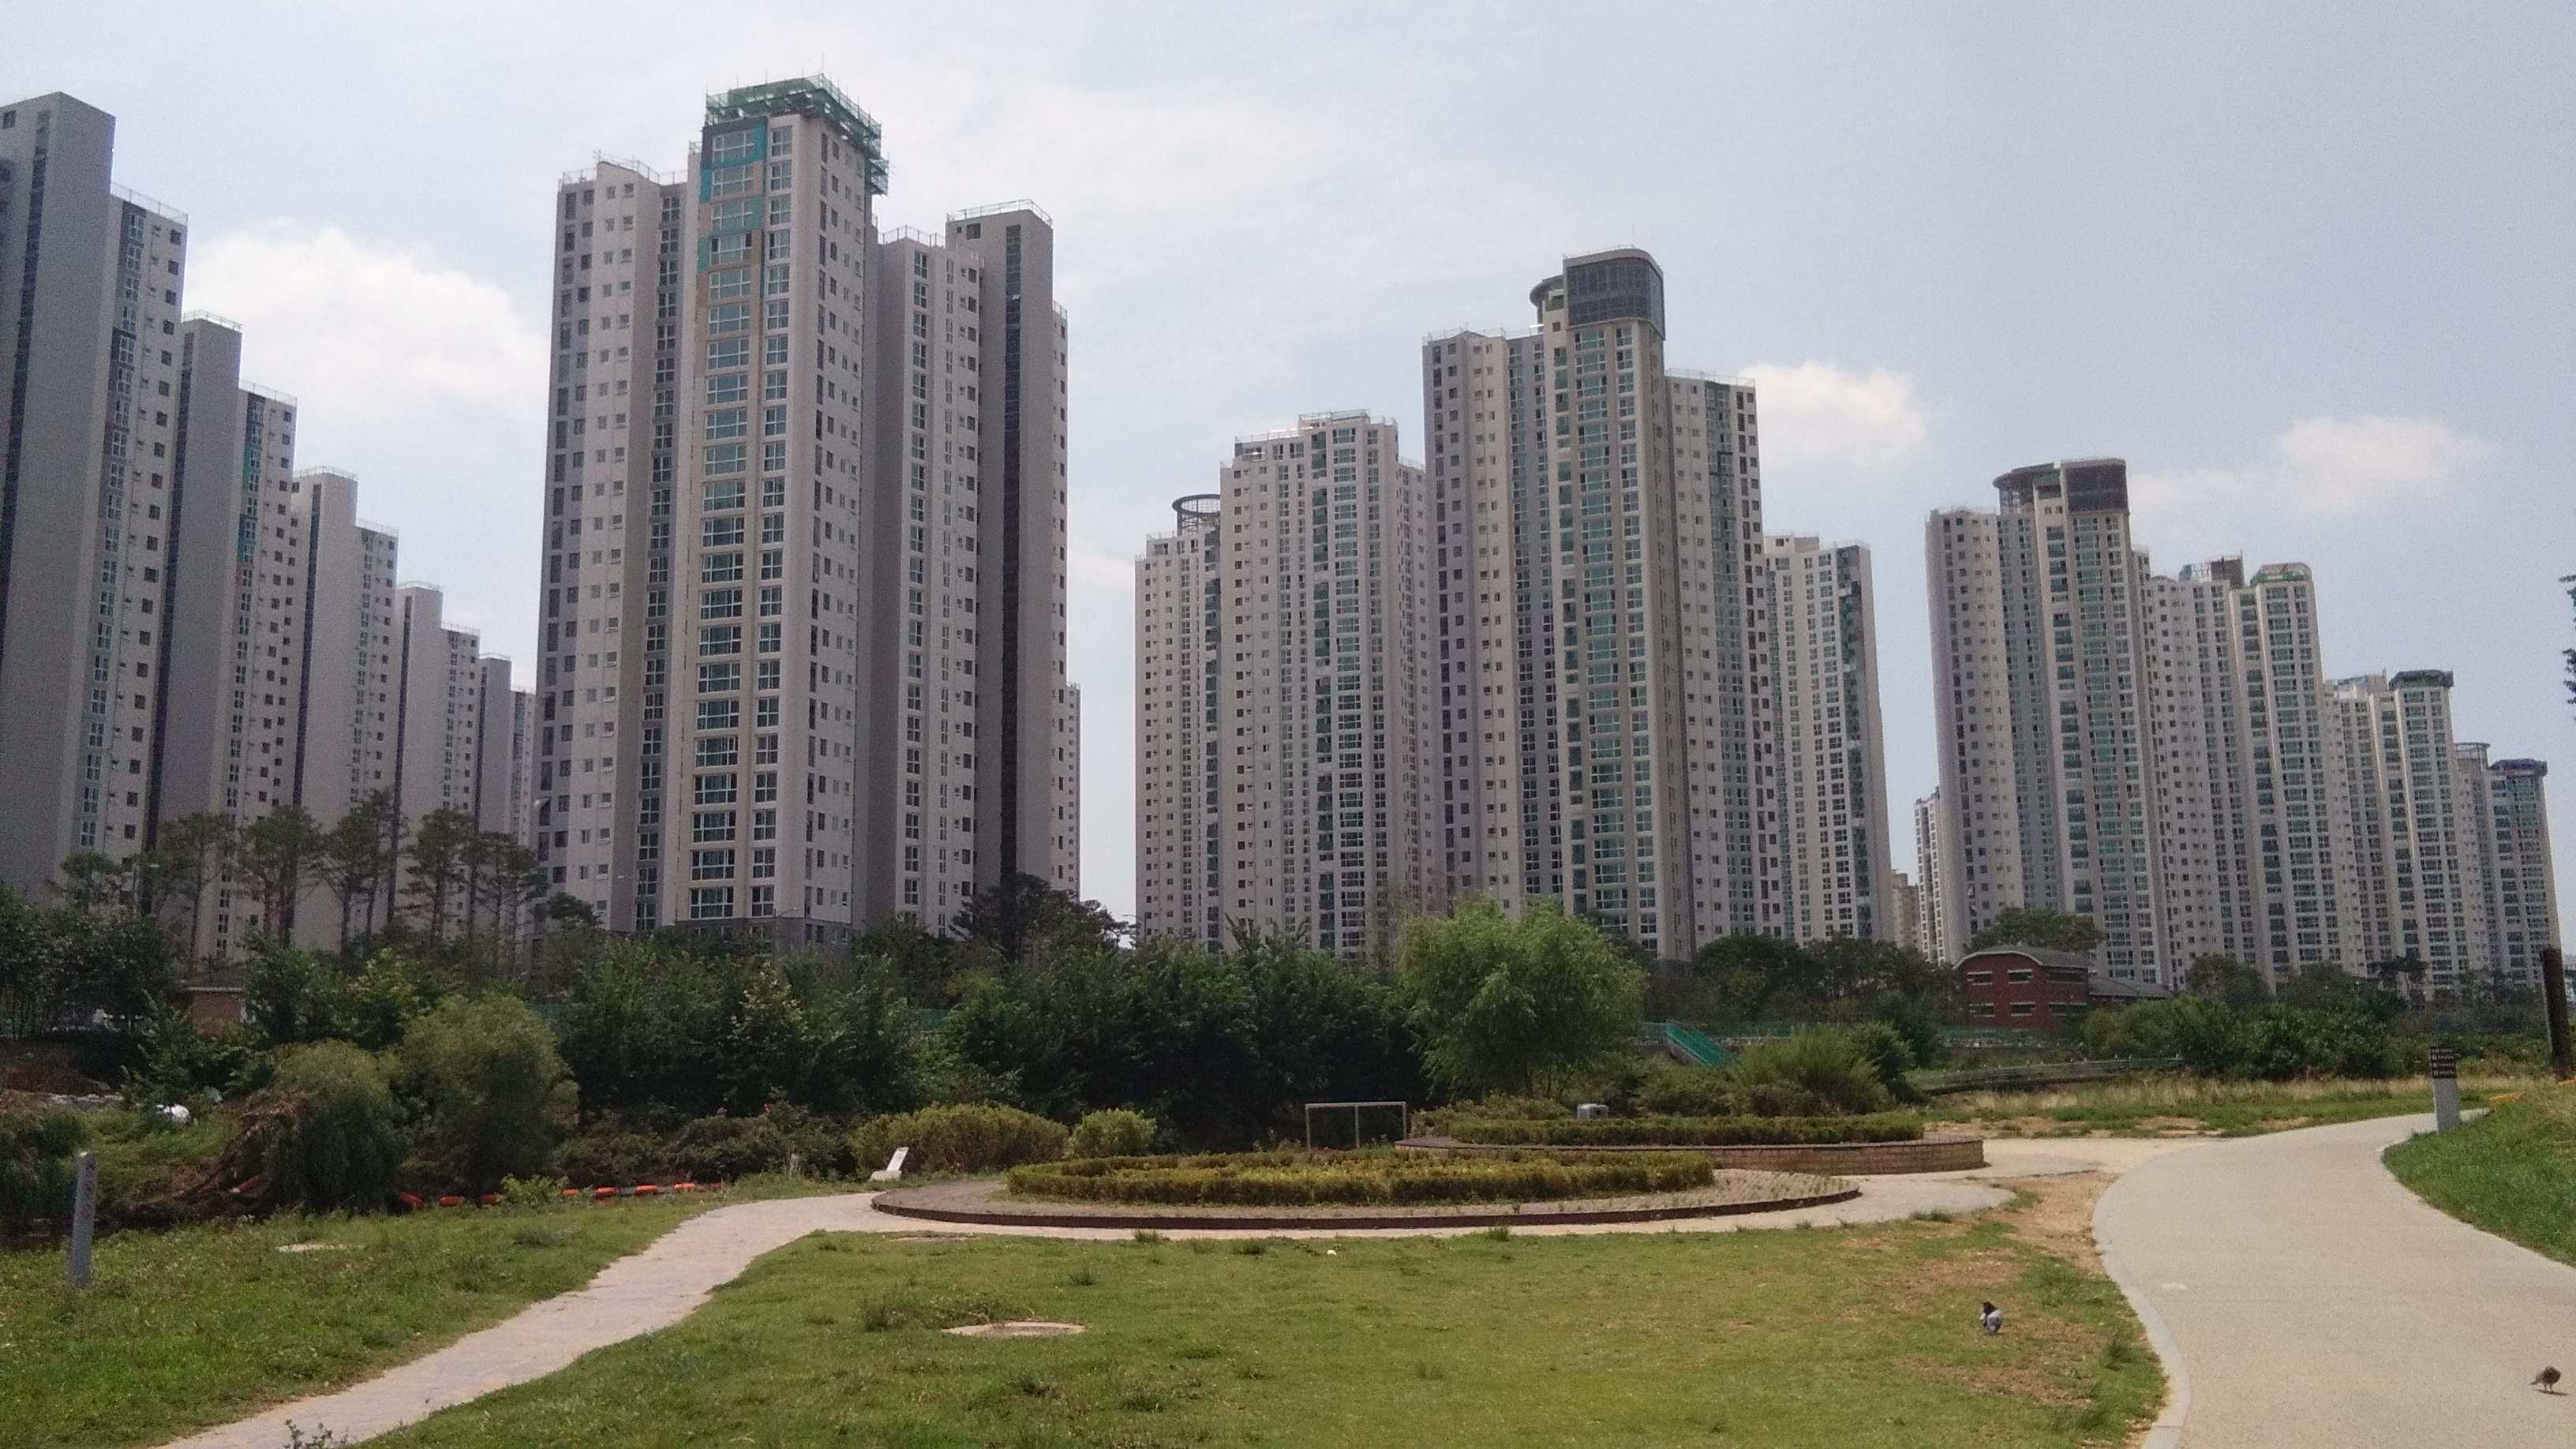 Seoul suburbs